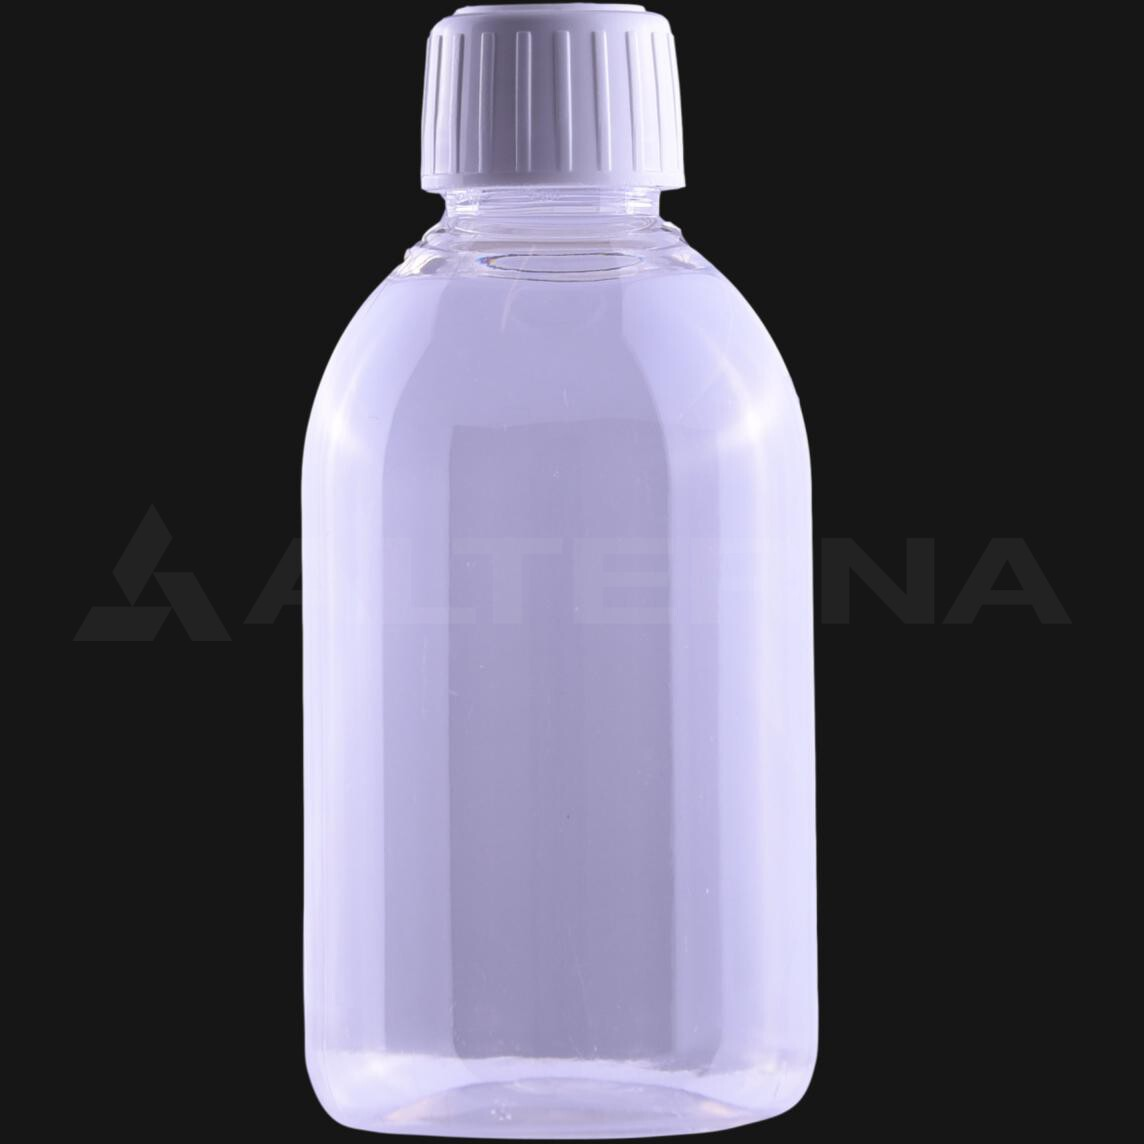 200 ml PET Pharma Bottle with 25 mm Tamper Evident Cap